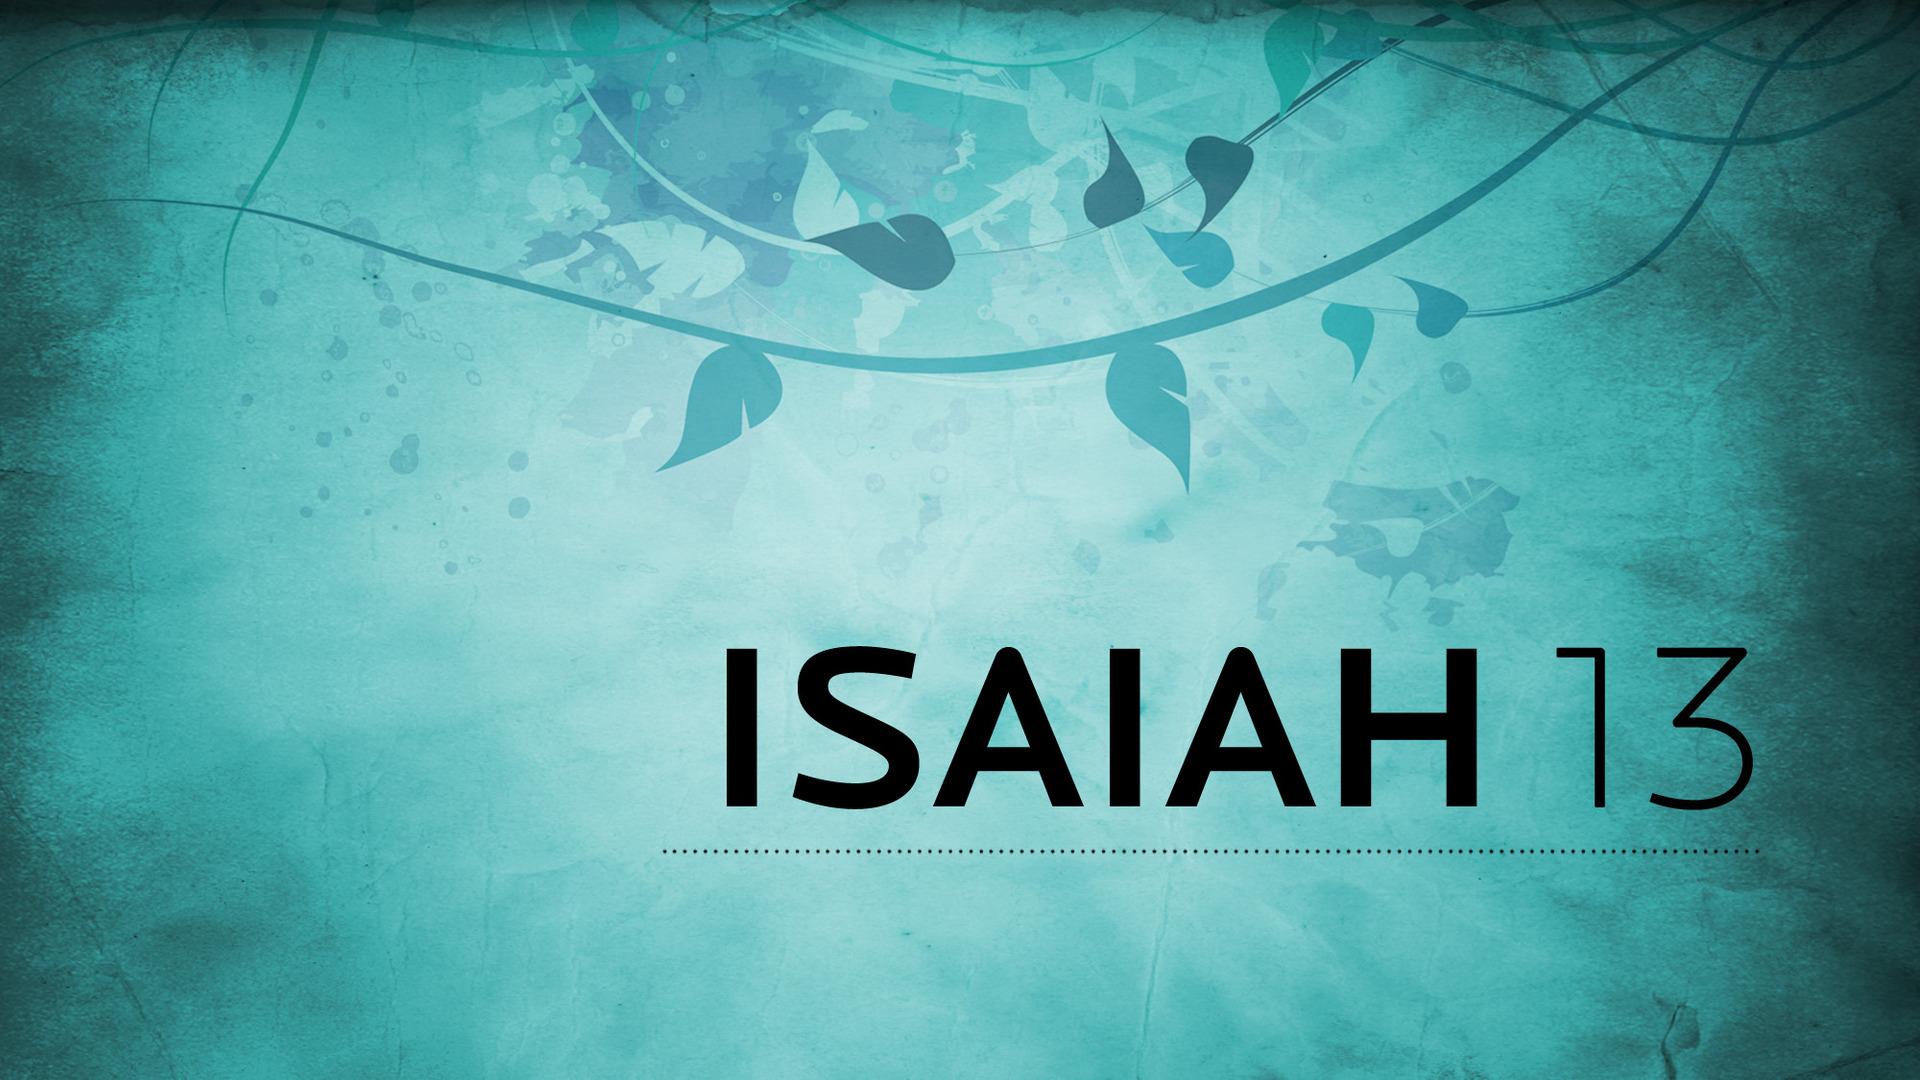 Isaiah 13